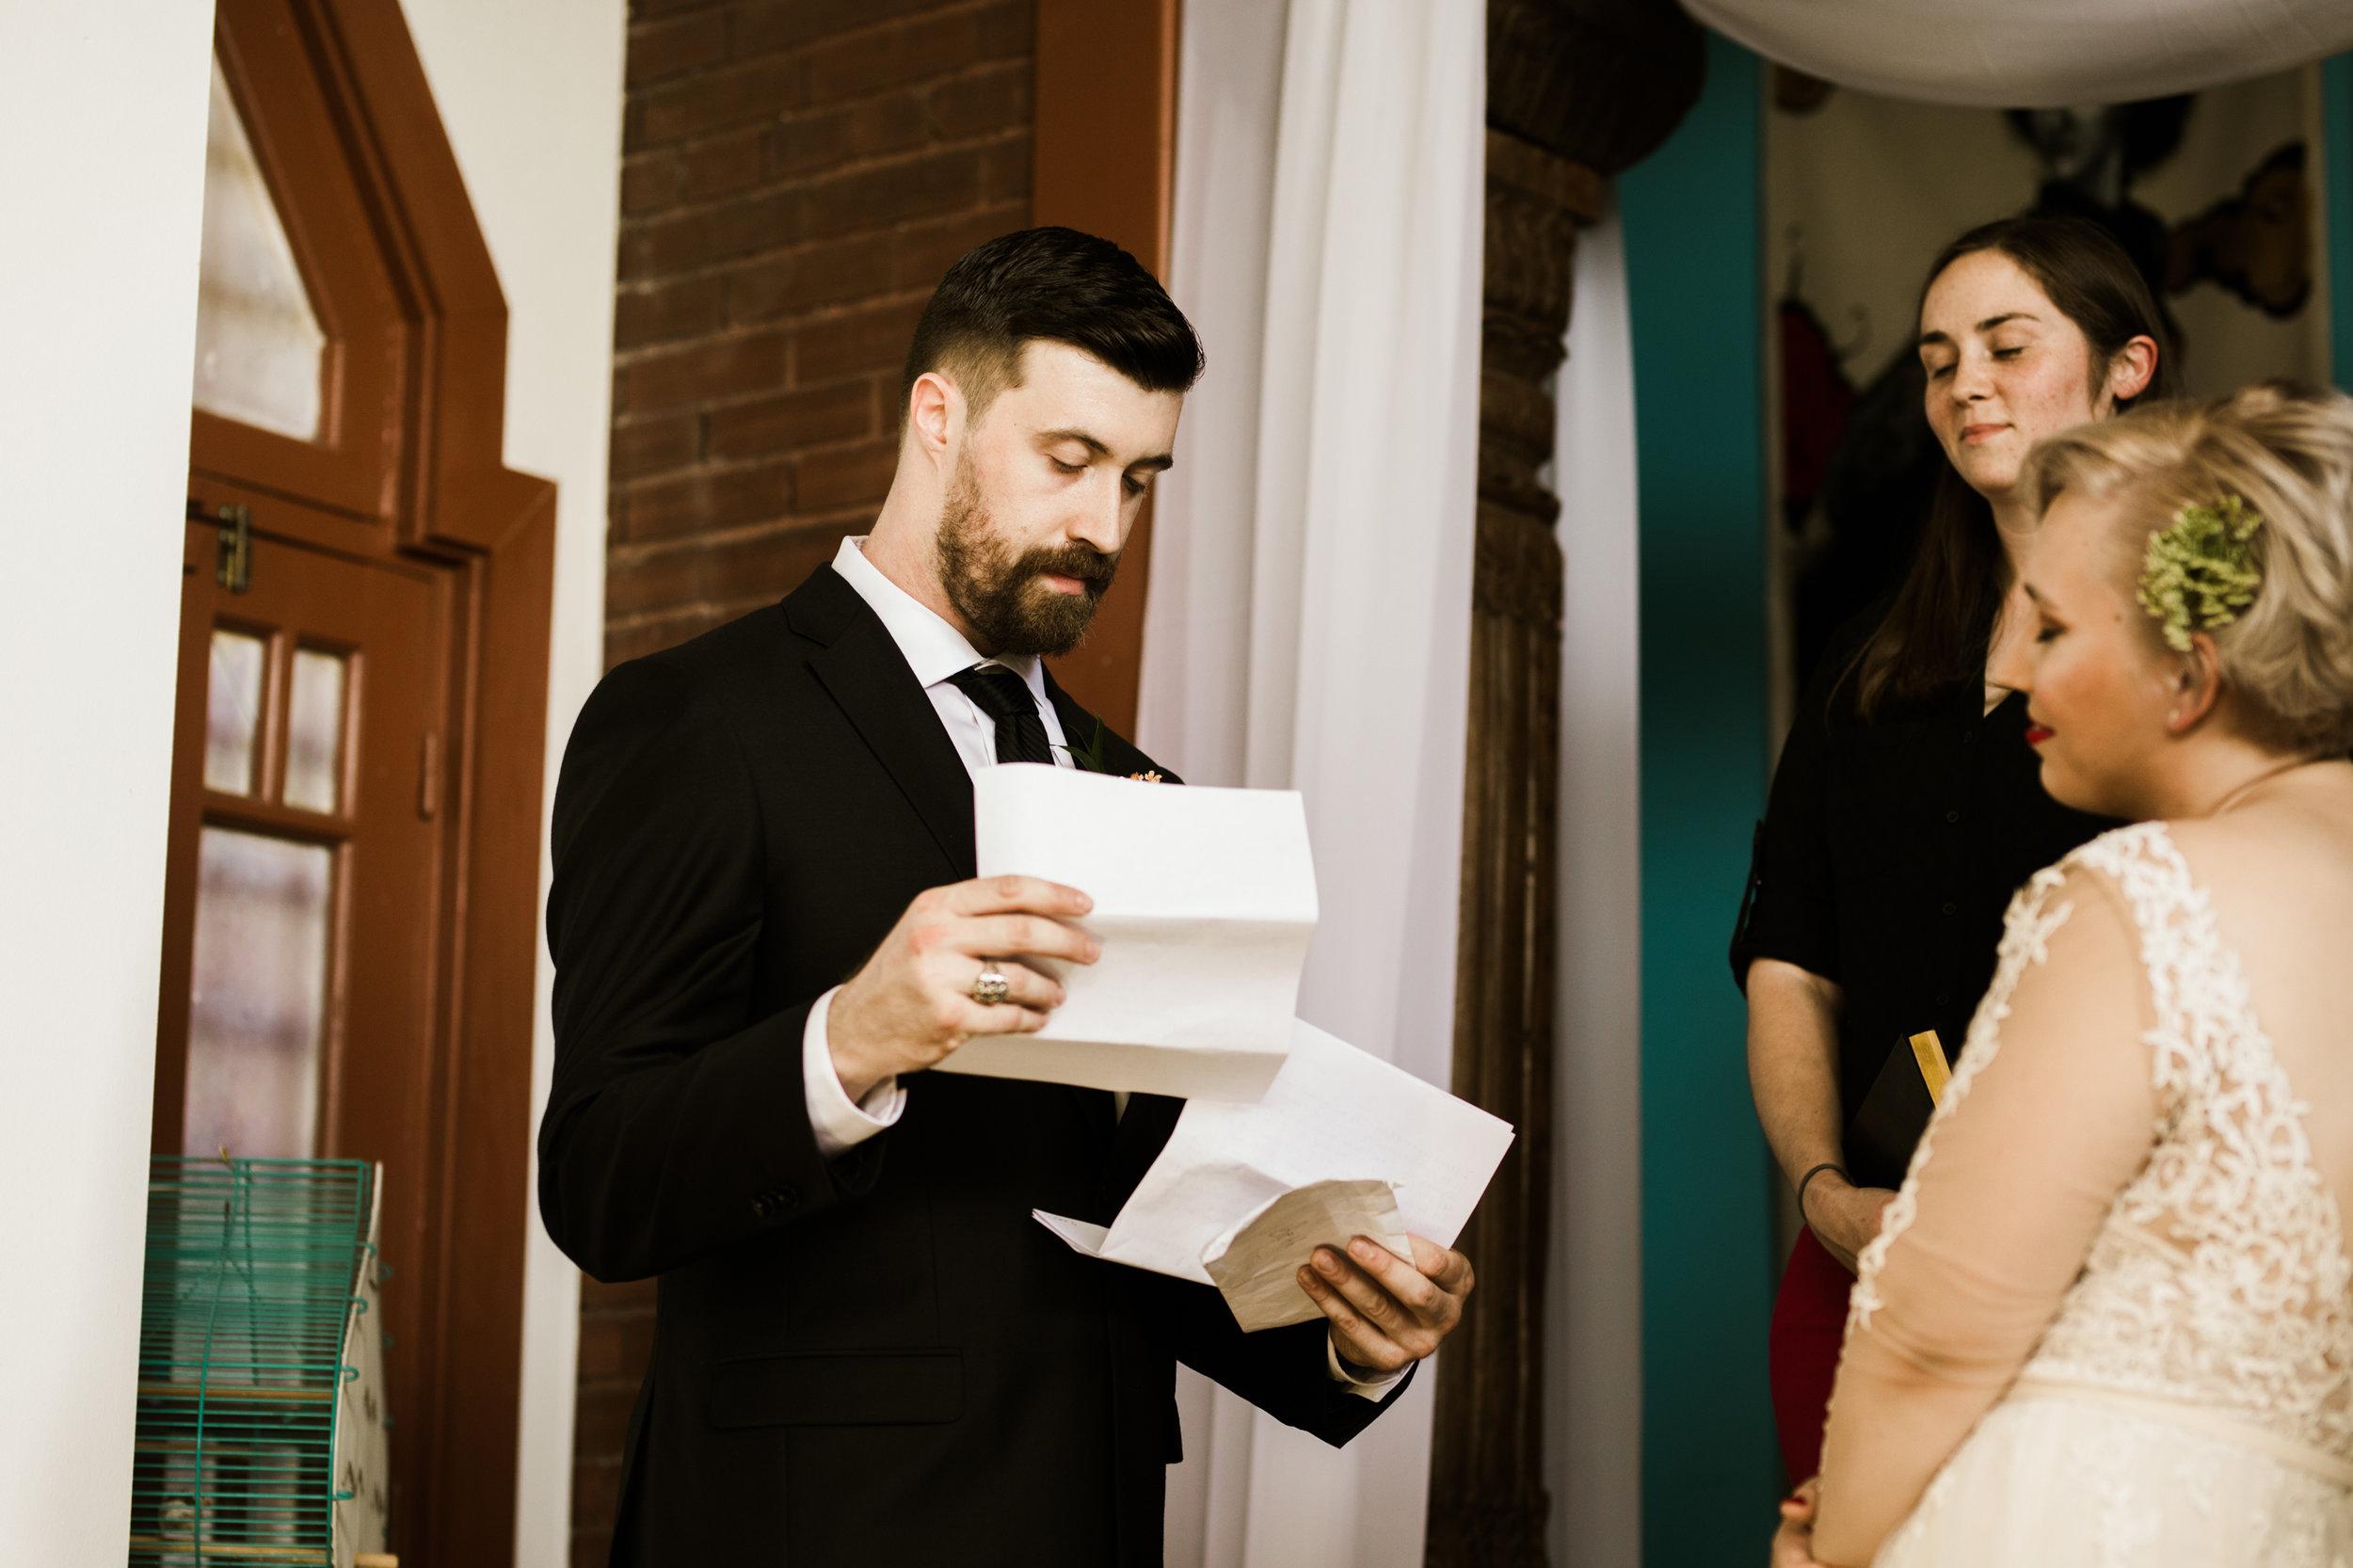 Kentucky Wedding Louisville Wedding Photographer 2018 Crystal Ludwick Photo Louisville Wedding Photographer Kentucky Wedding Photographer (49 of 105).jpg